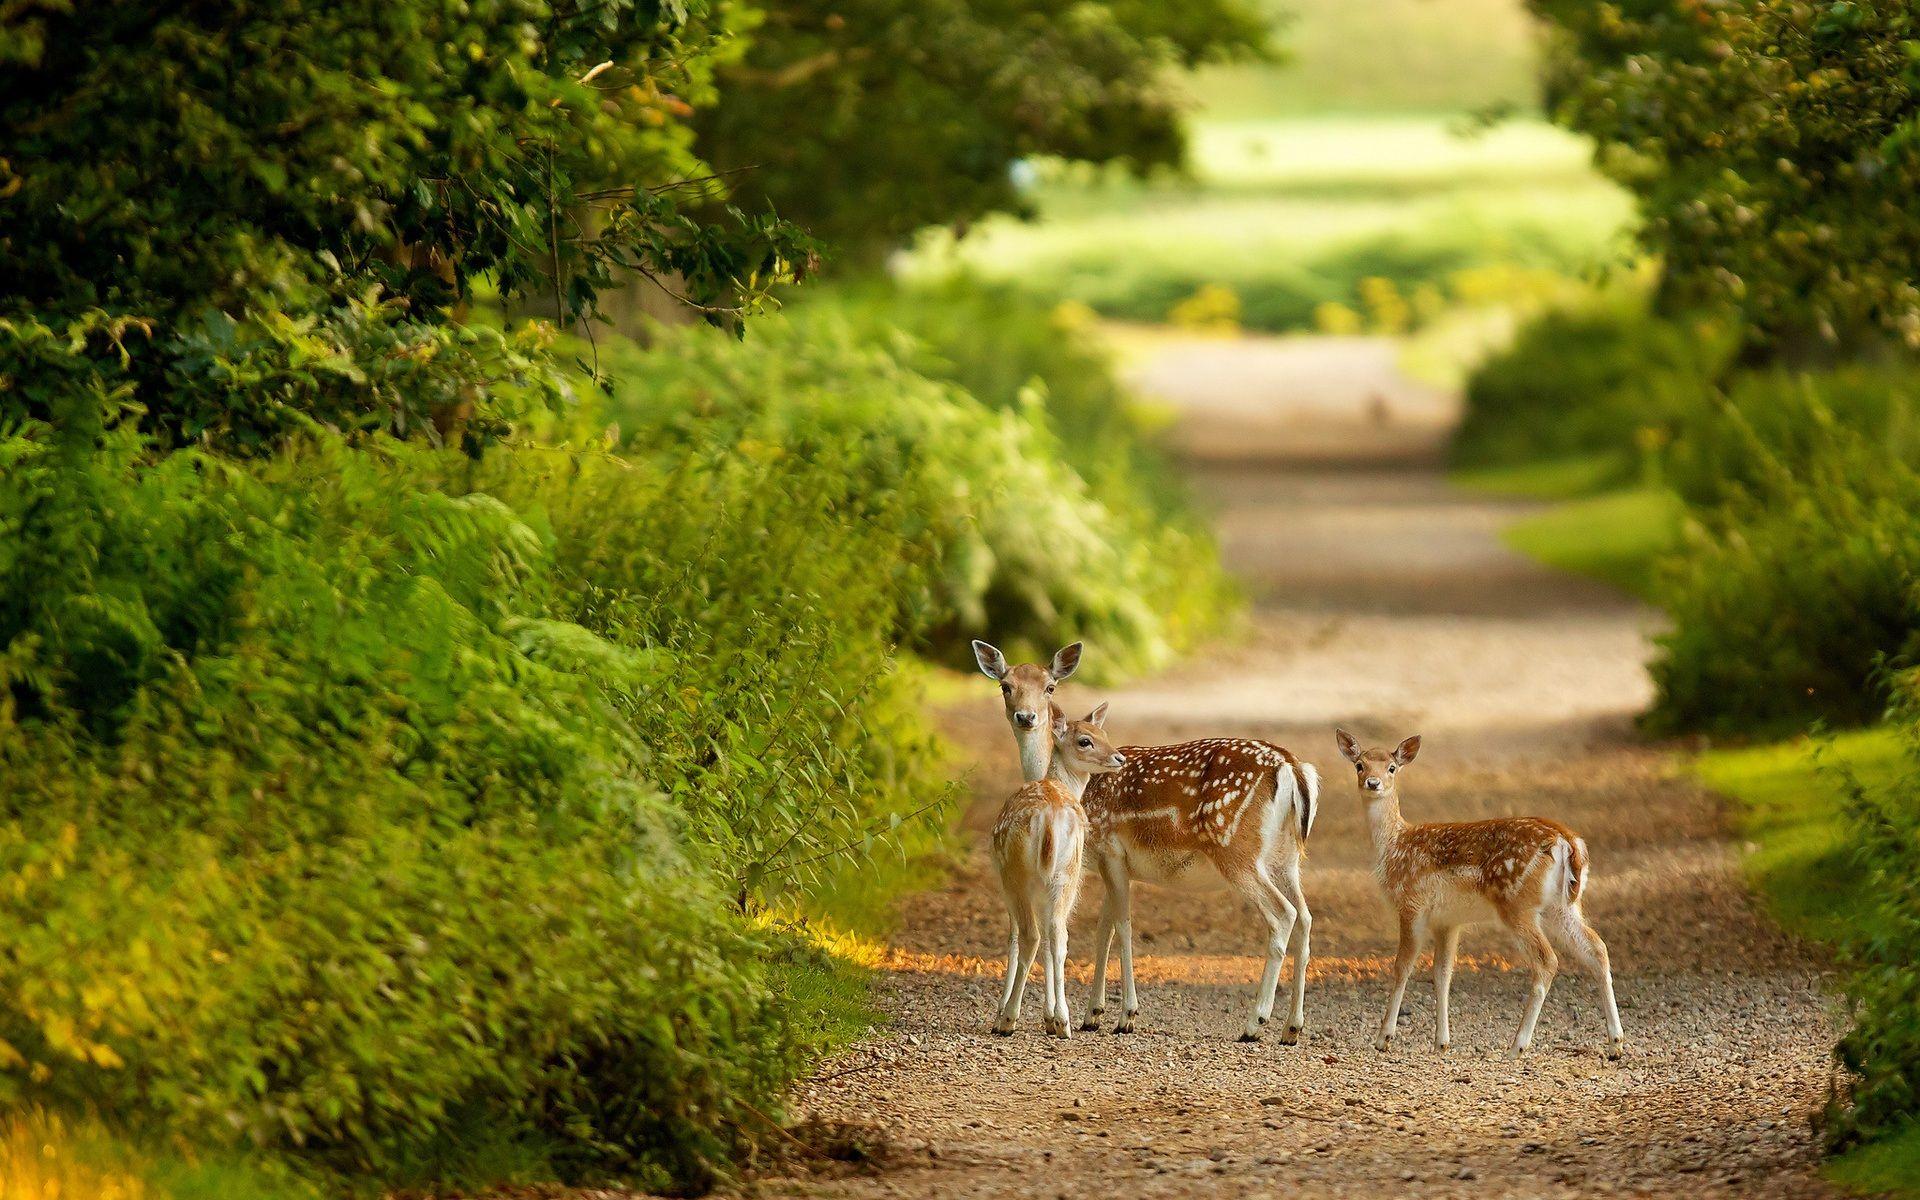 deer images free download